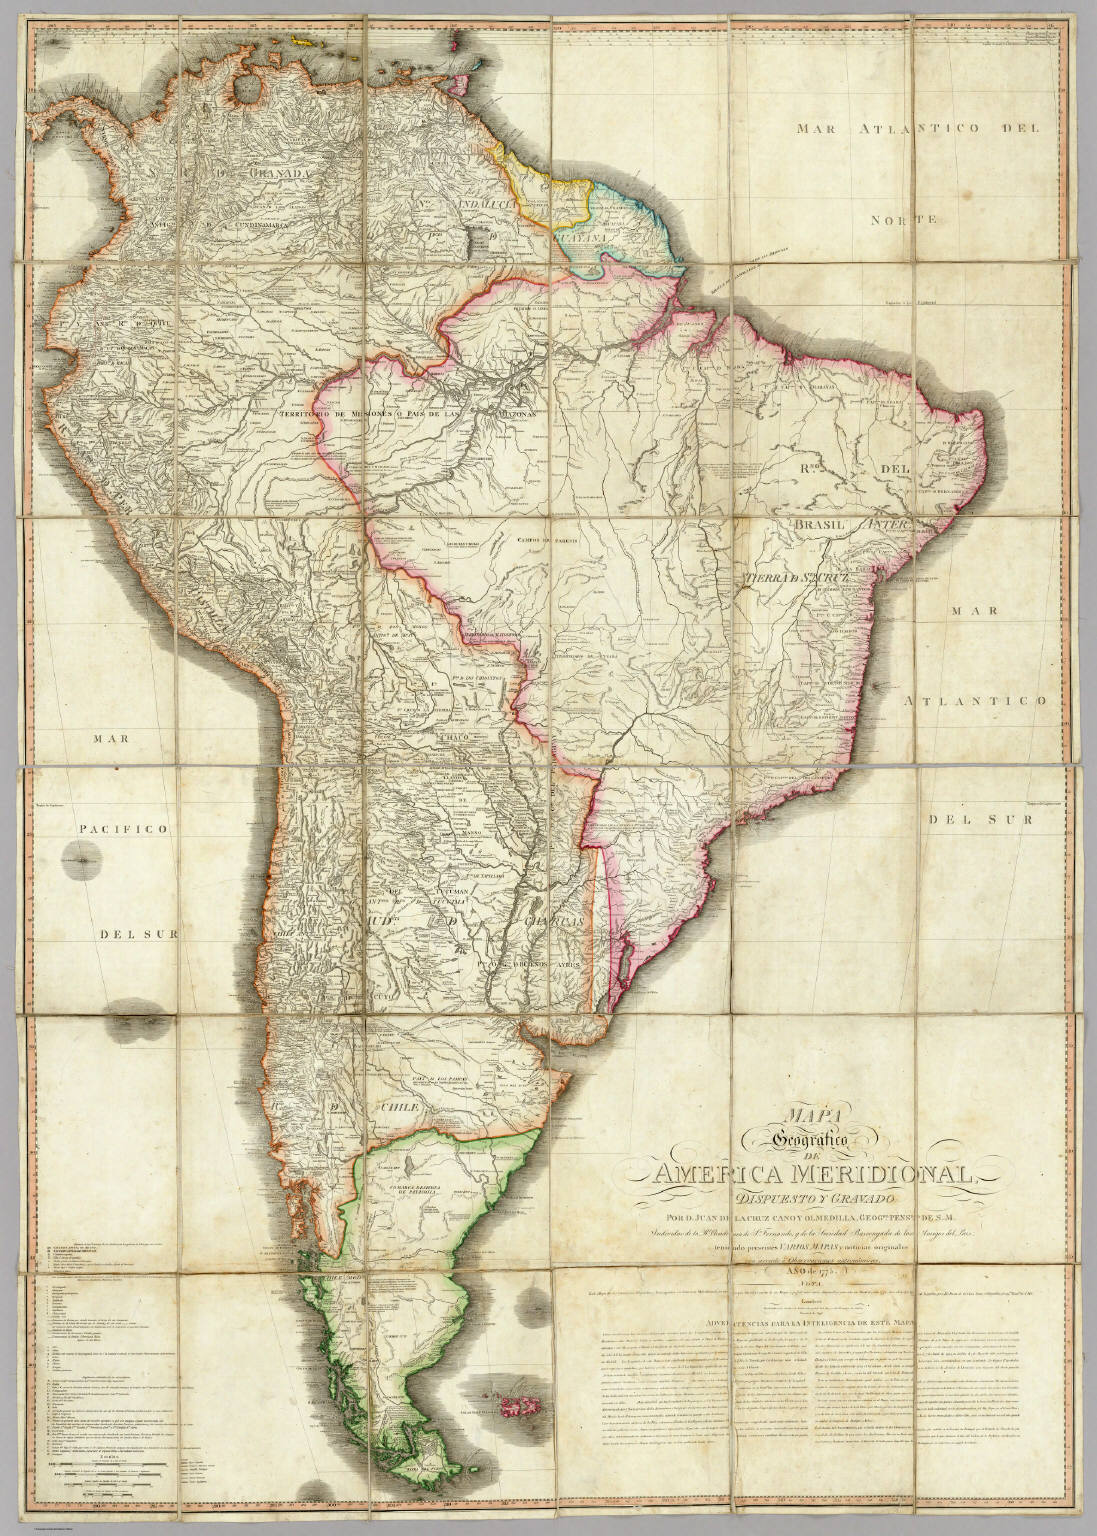 Mapa Geografico De America Meridional David Rumsey Historical Map Collection